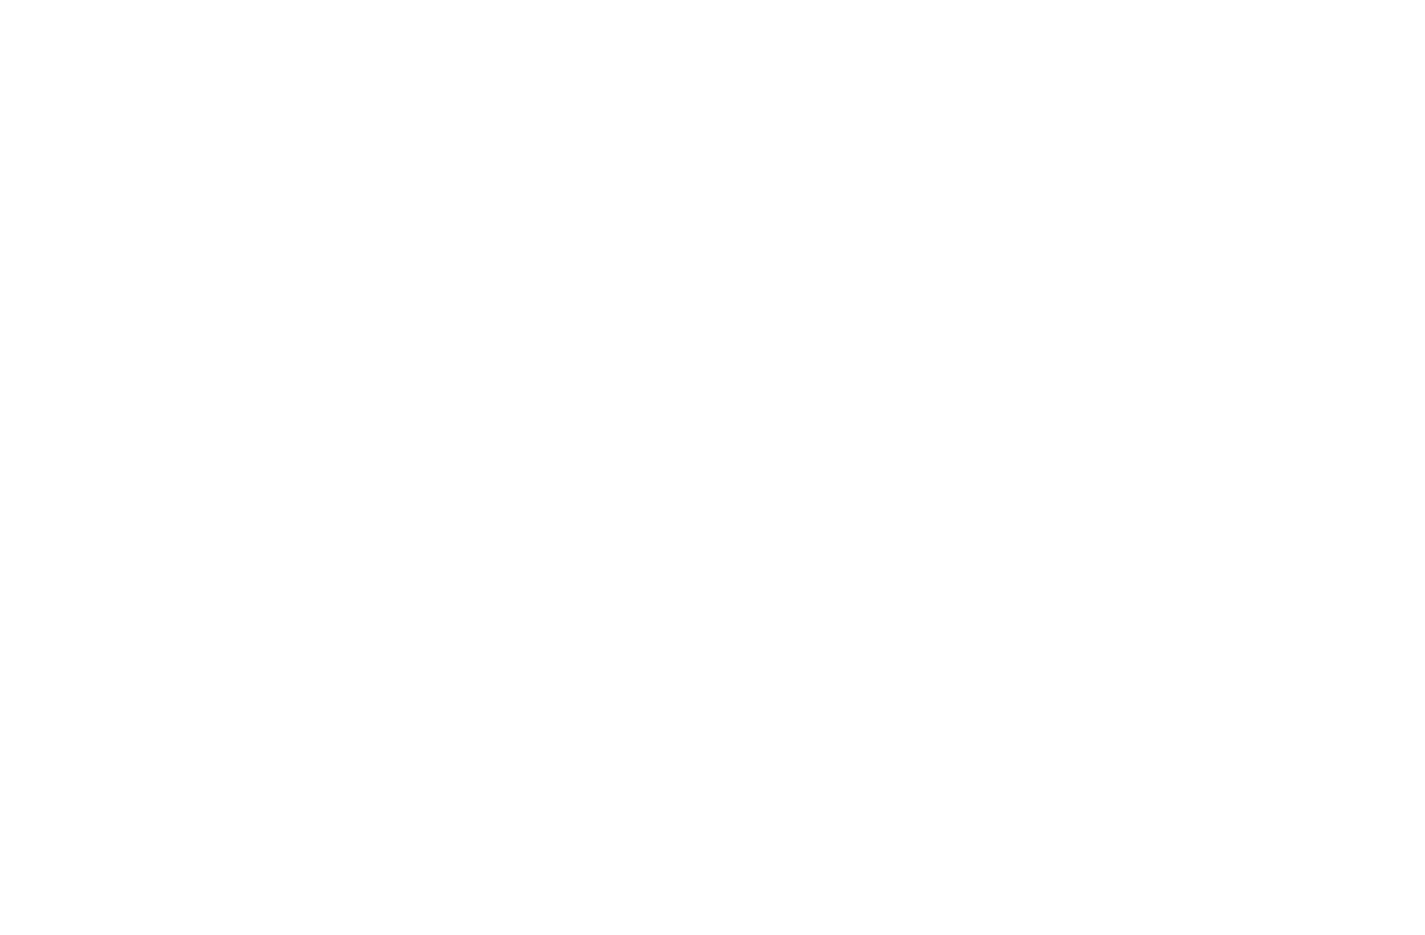 Muizen fokken